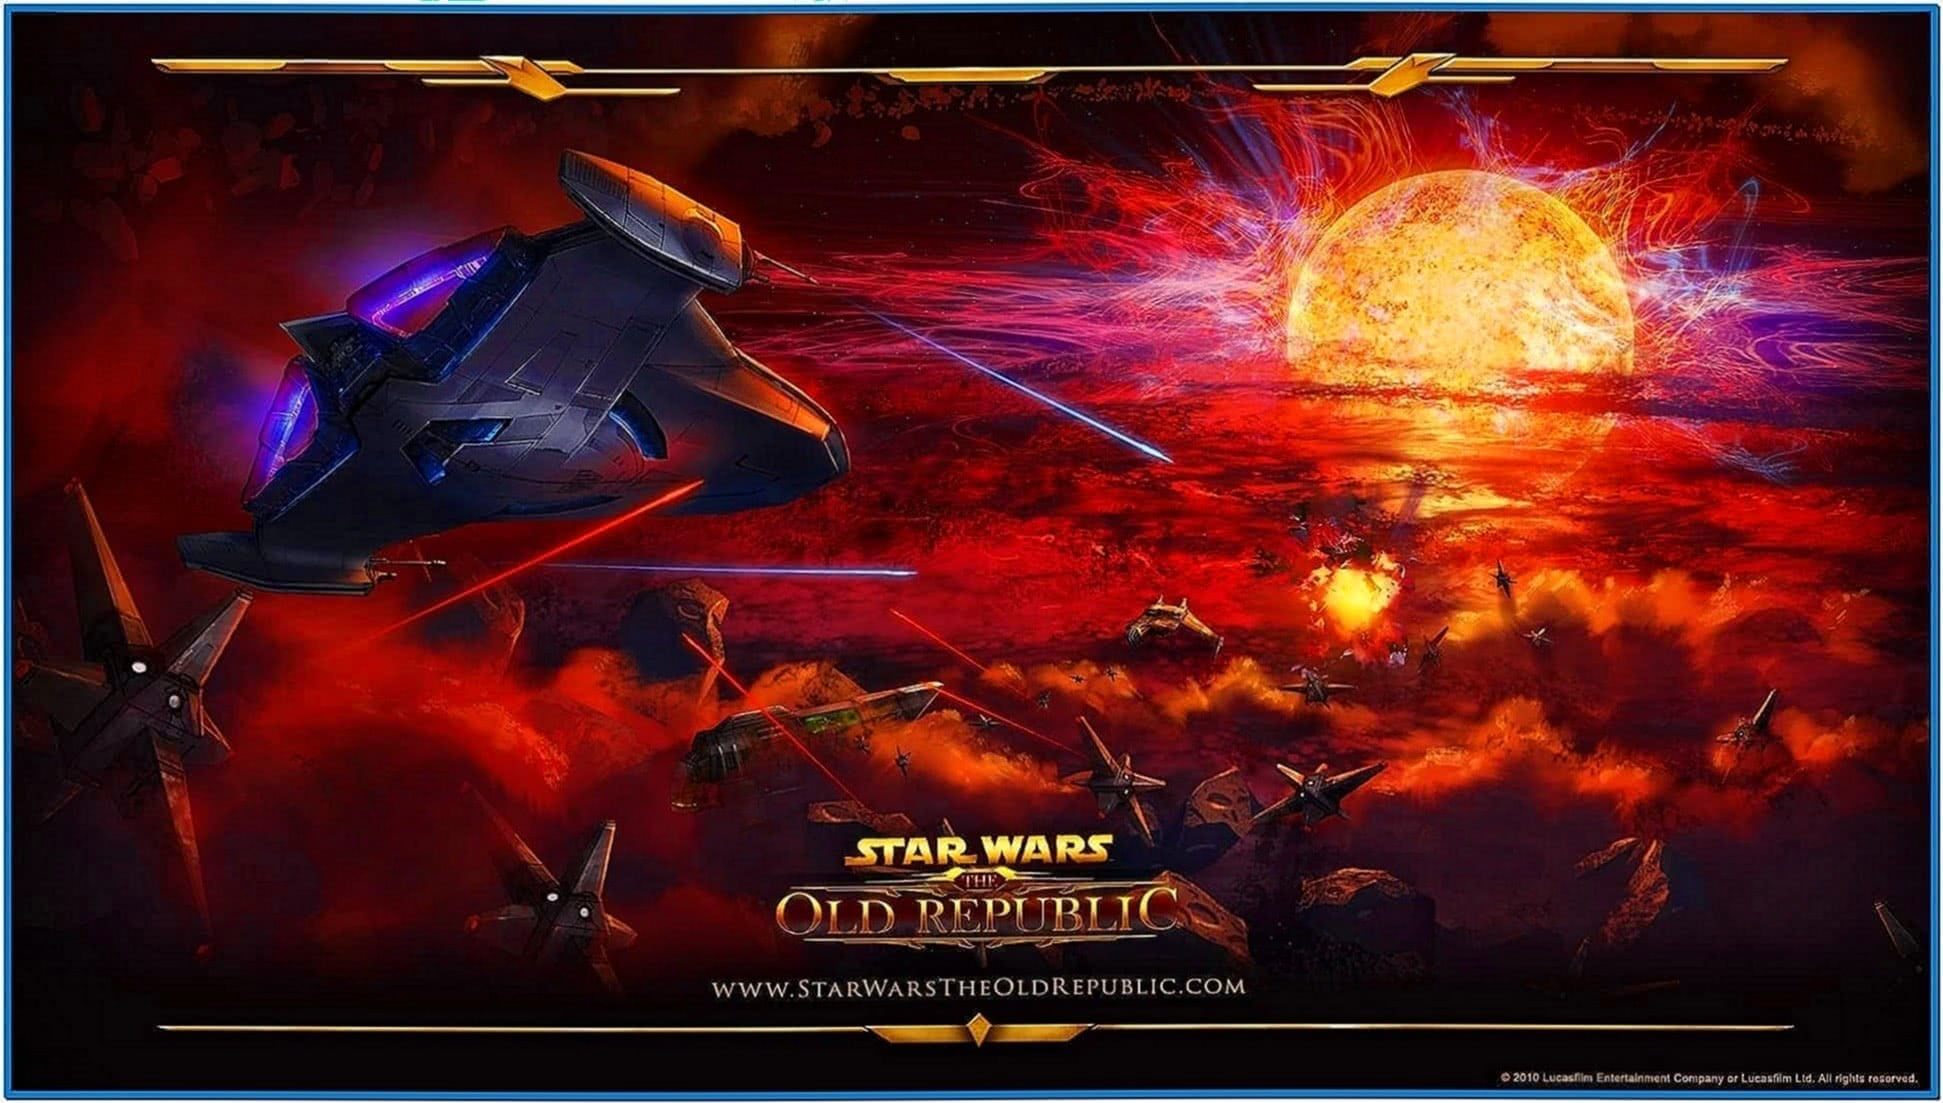 Star wars space battle screensaver Mac